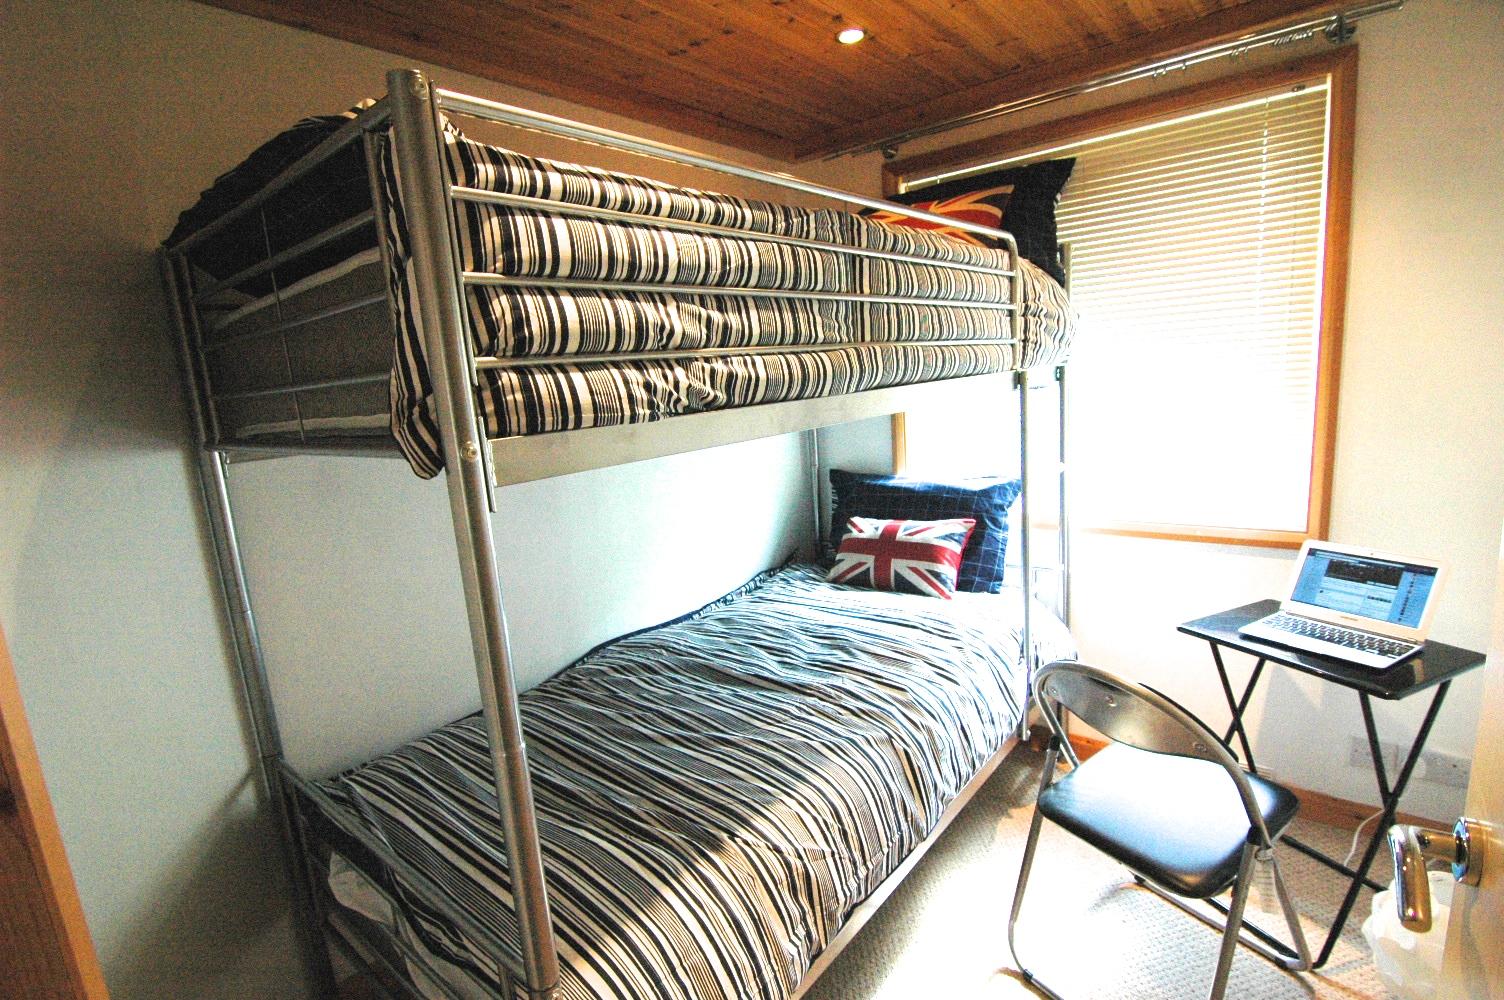 BUNK BEDS R3